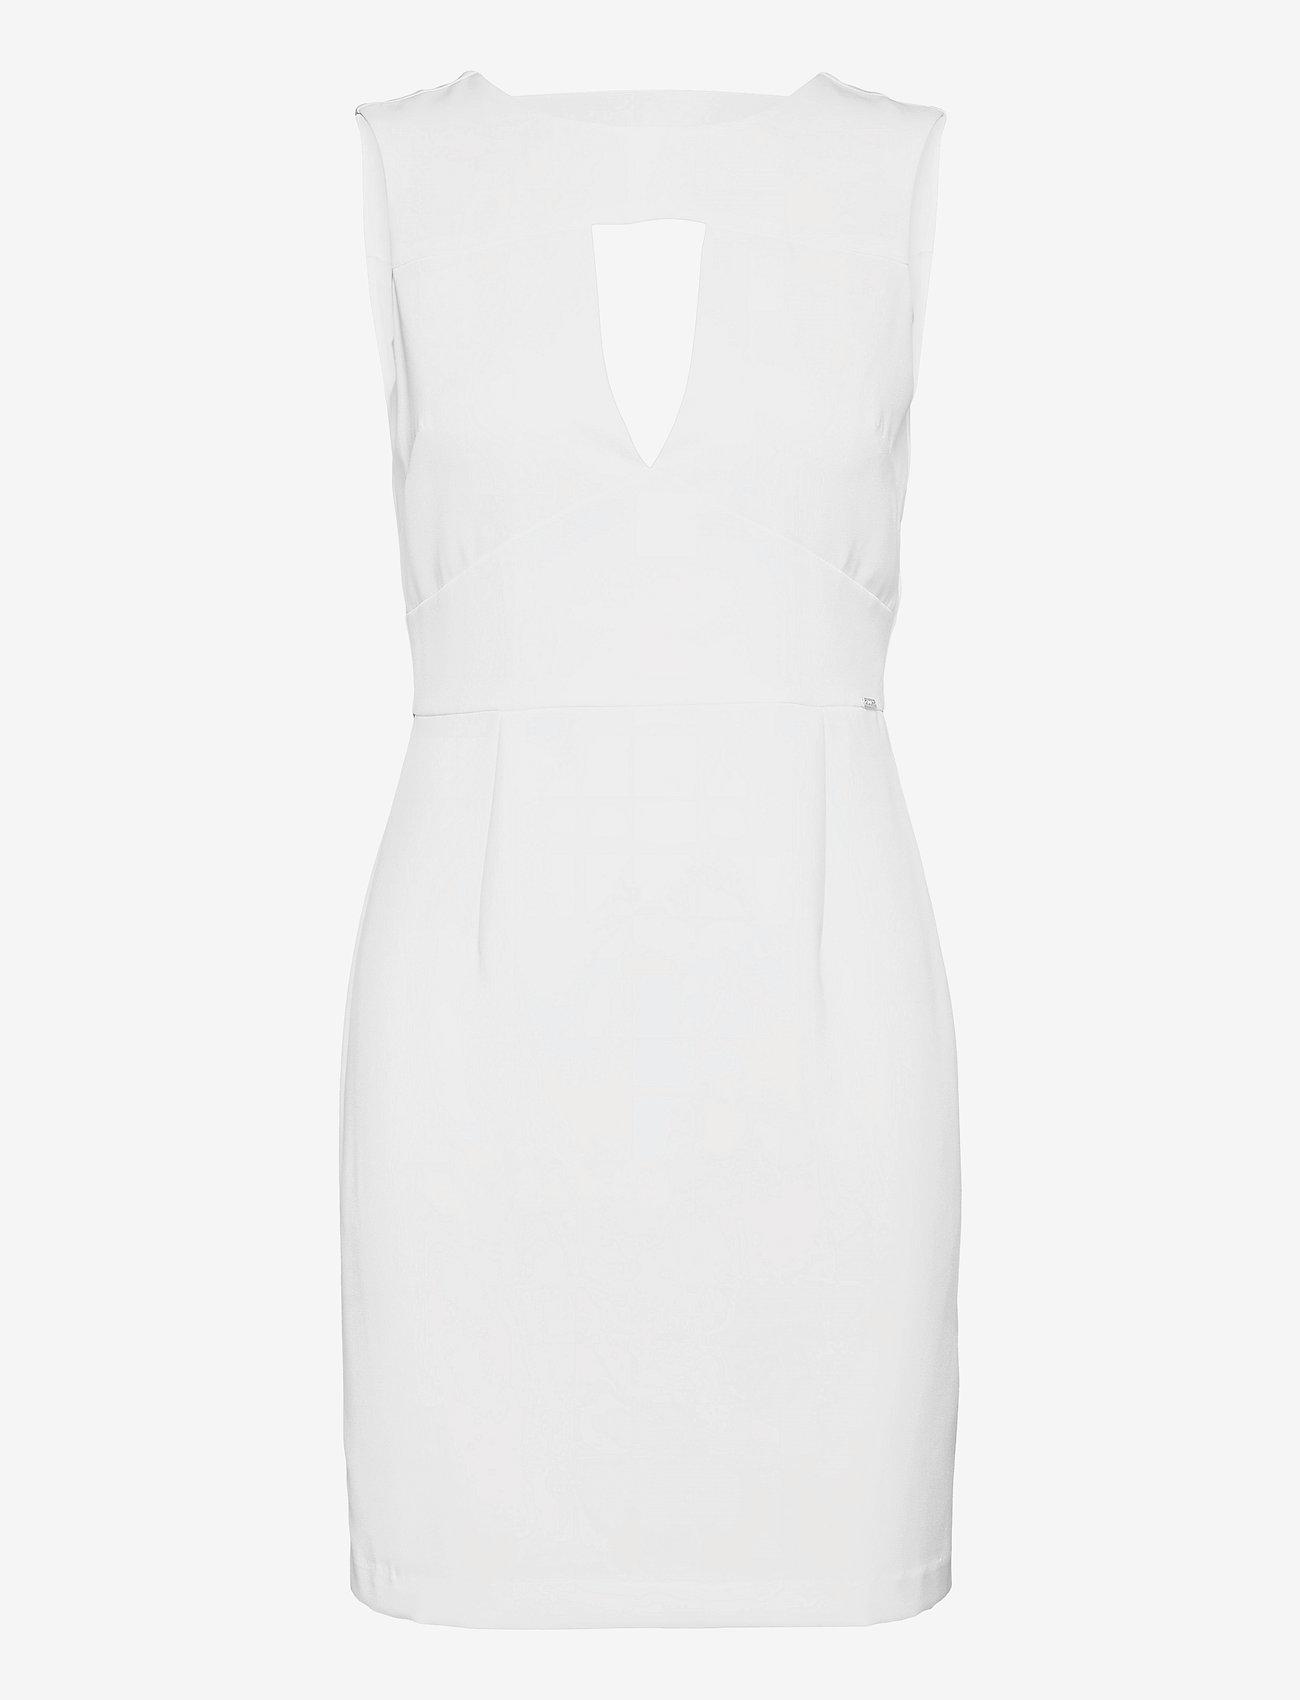 GUESS Jeans - PATTI DRESS - sommarklänningar - true white a000 - 0